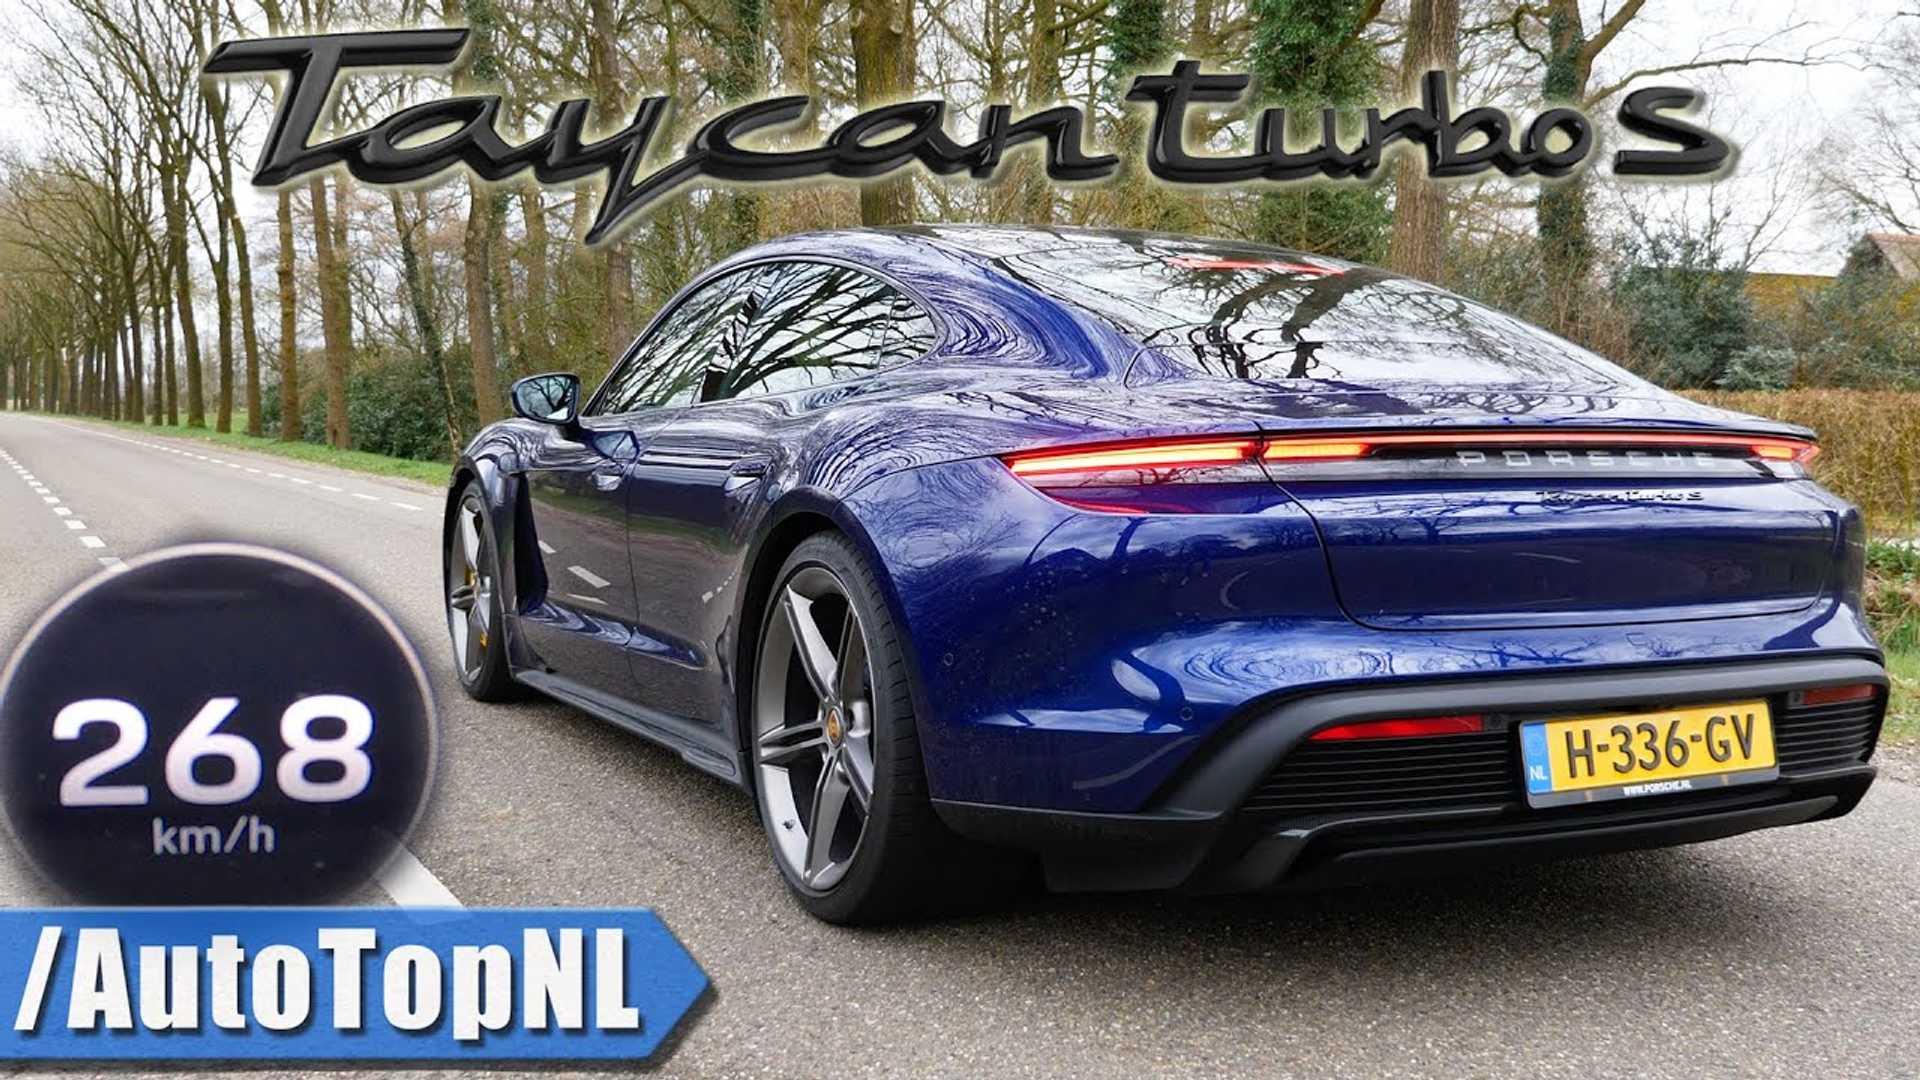 Porsche Taycan Turbo S: kolor niebieski (blue)